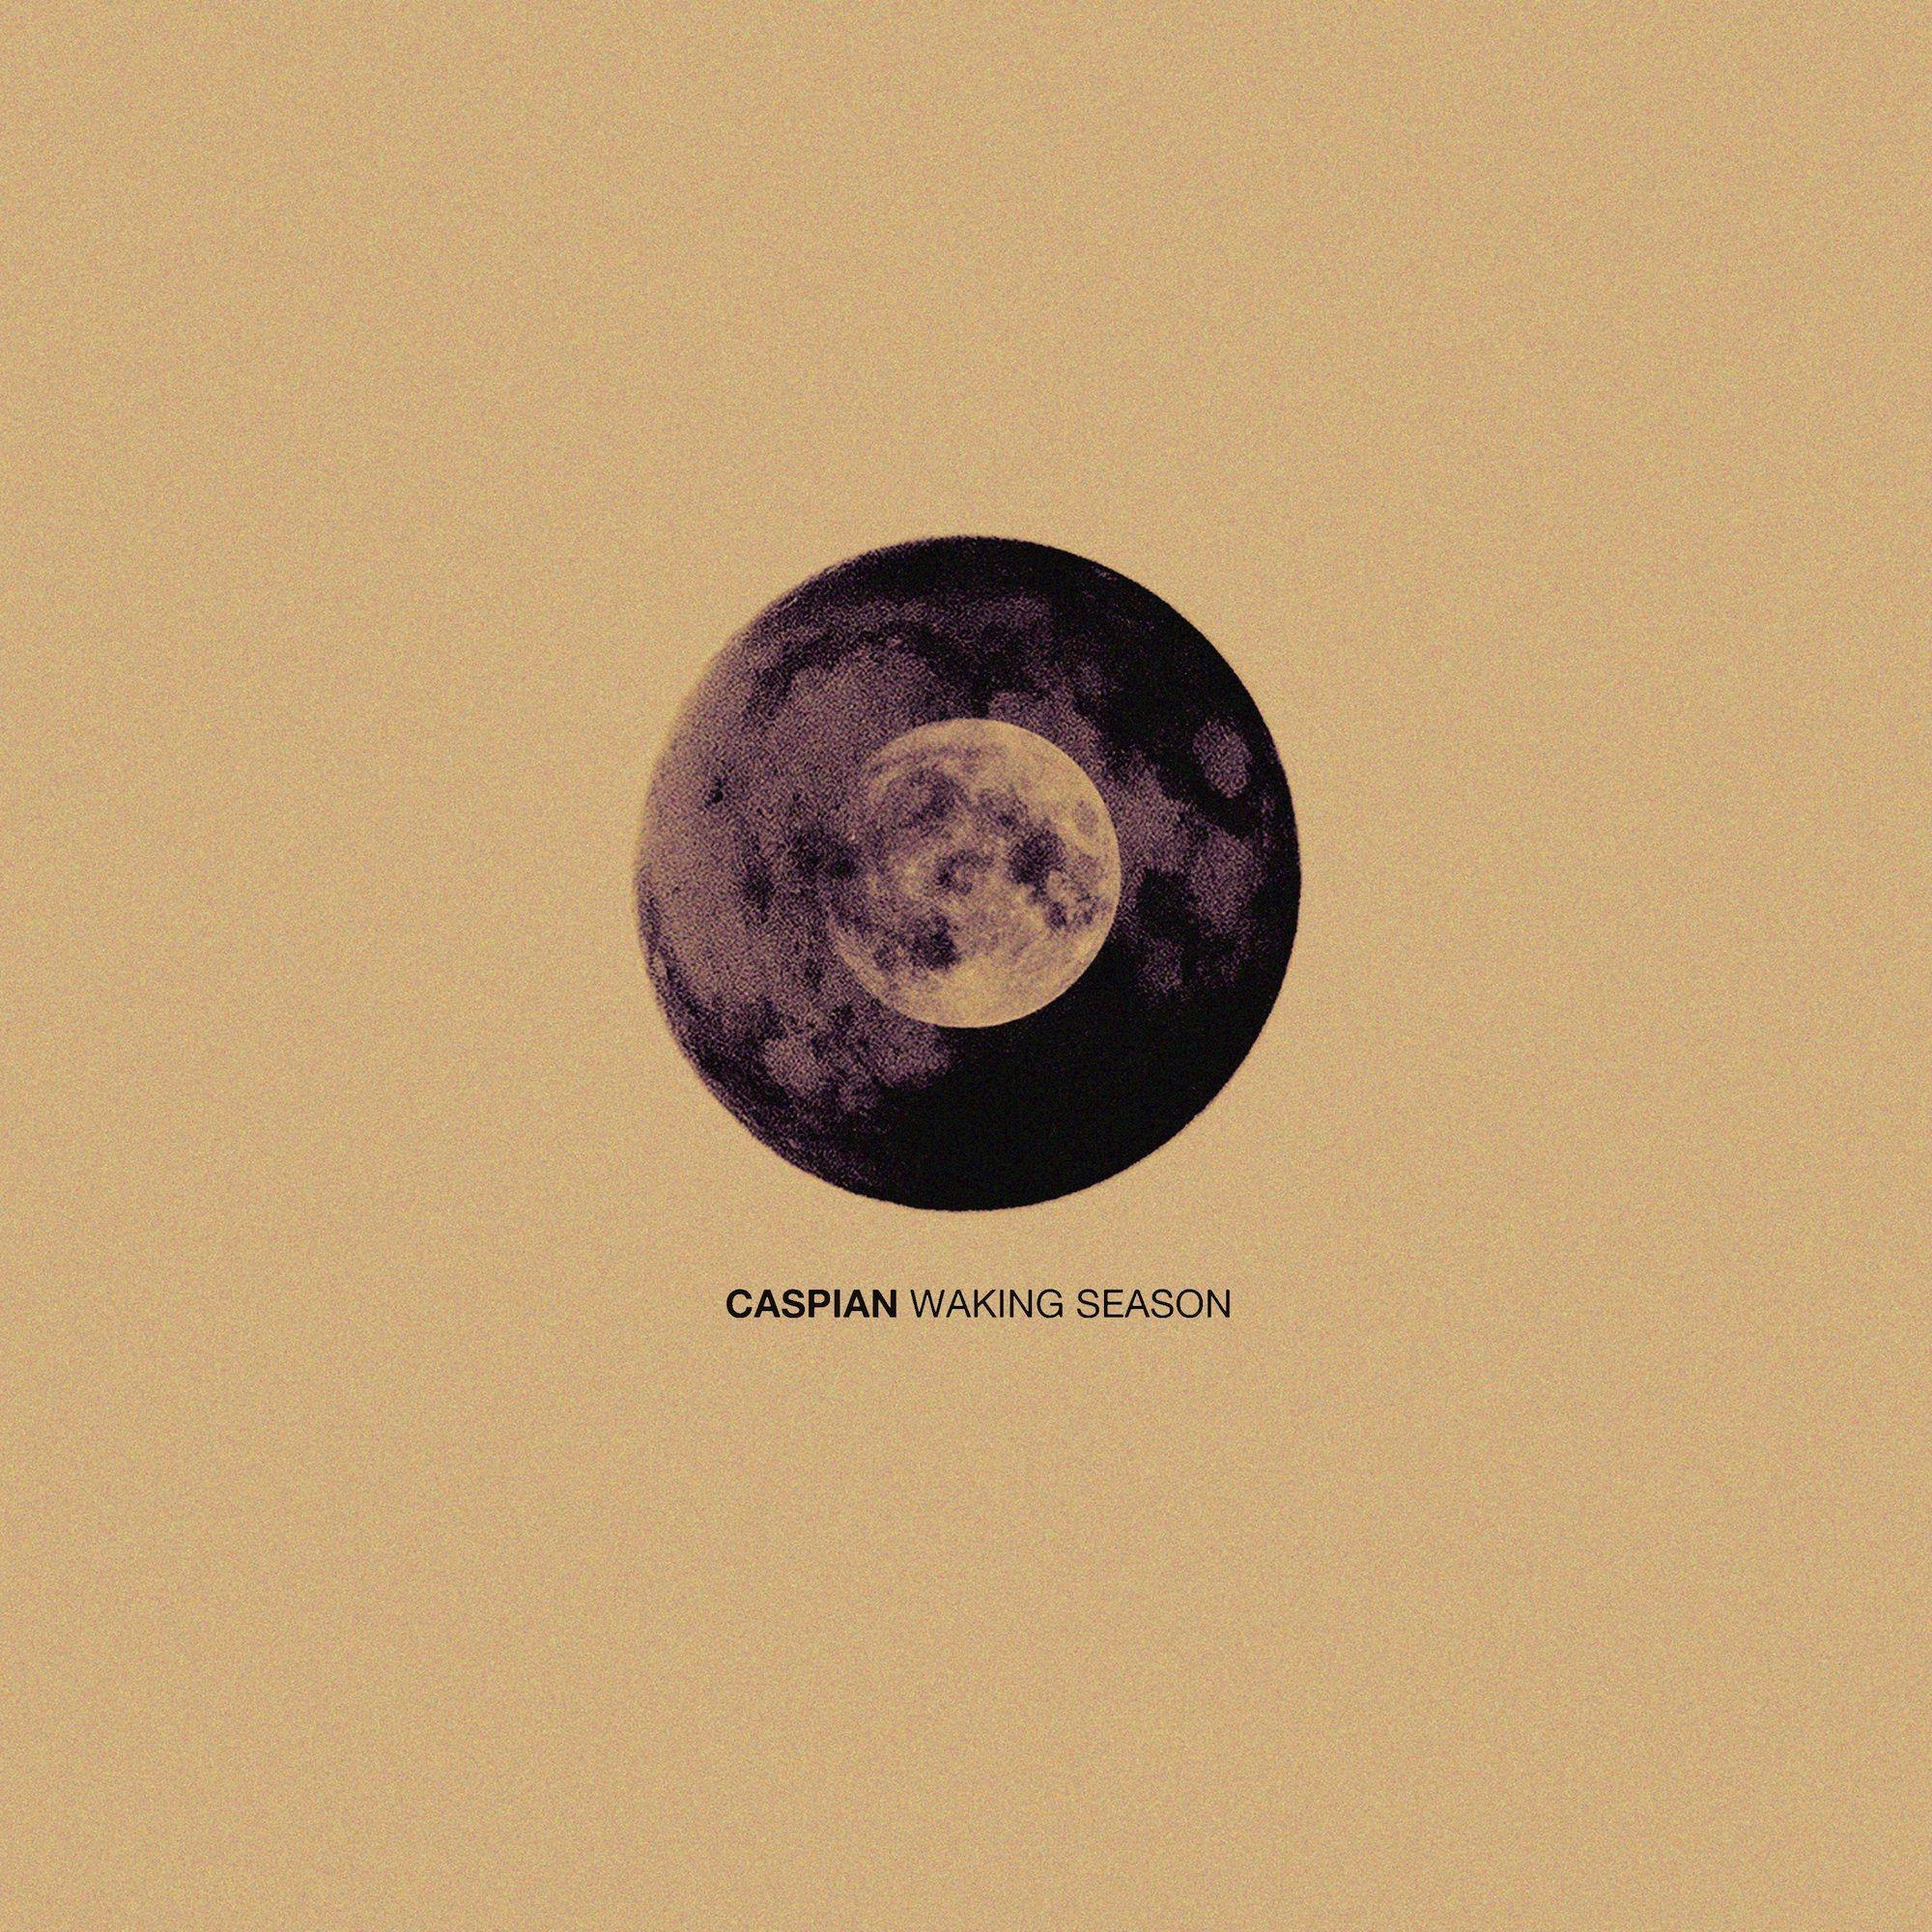 Waking Season By Caspian Music Blog Post Rock Album